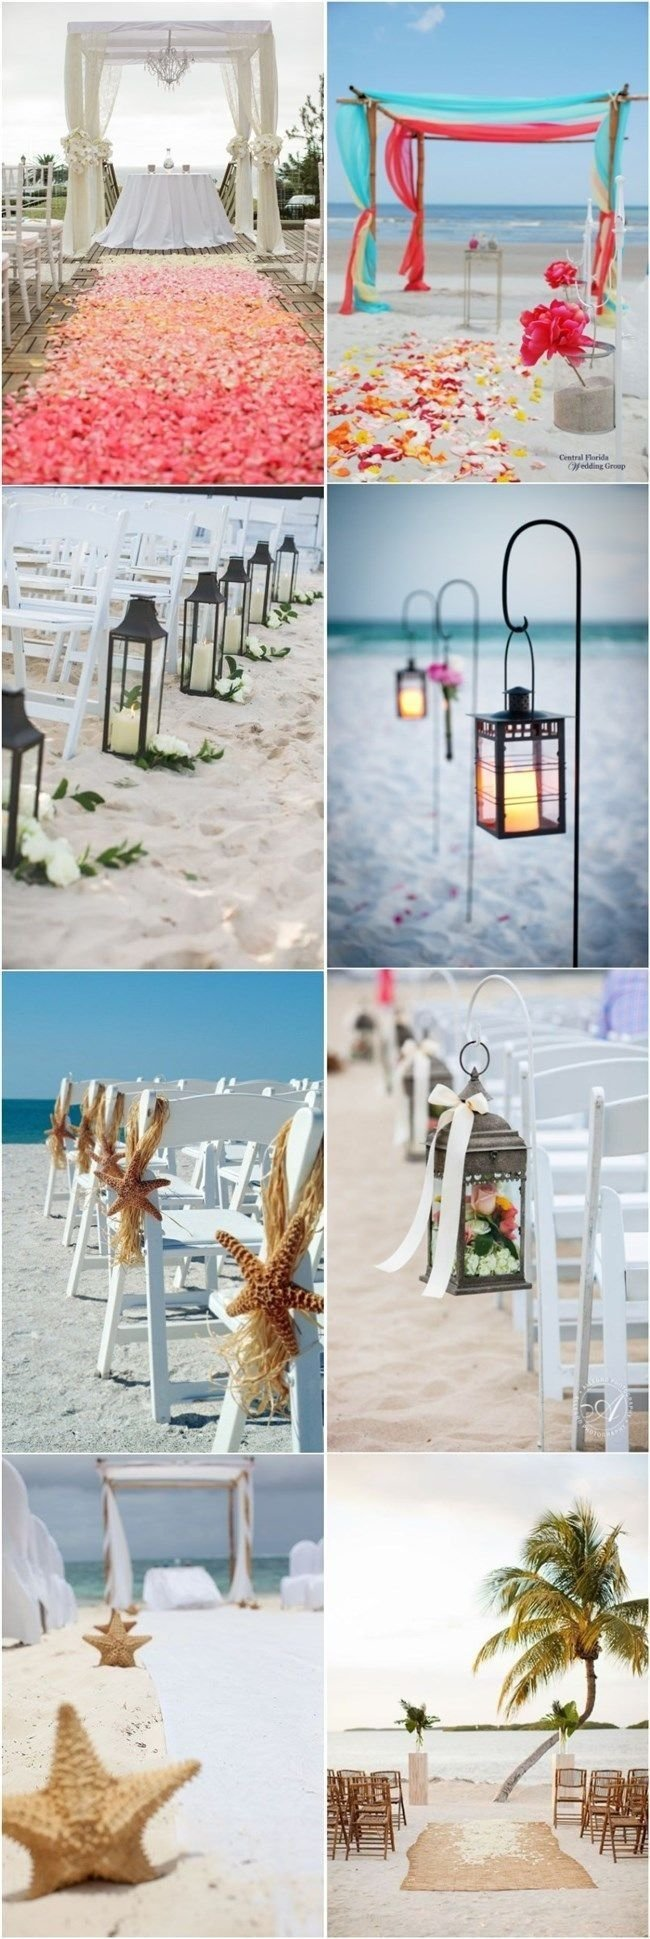 beach wedding decor ideas-beach wedding aisles | home improvement